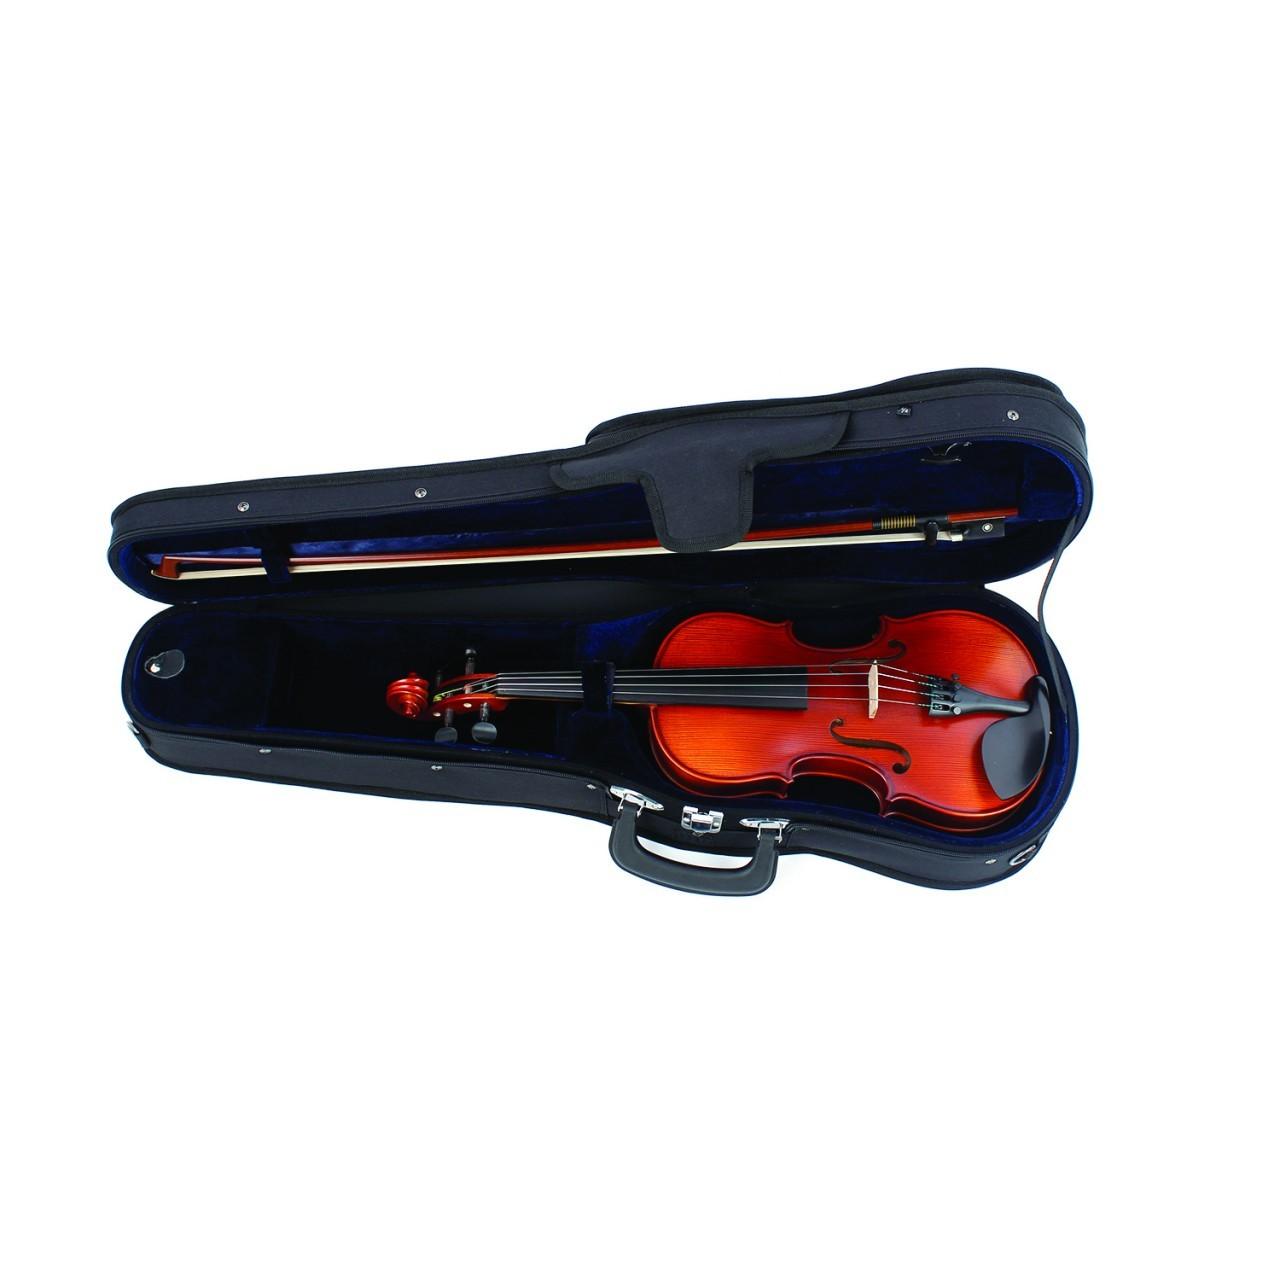 Höfner Violingarnitur II 3/4 golden handlackiert mit Etui + Bogen